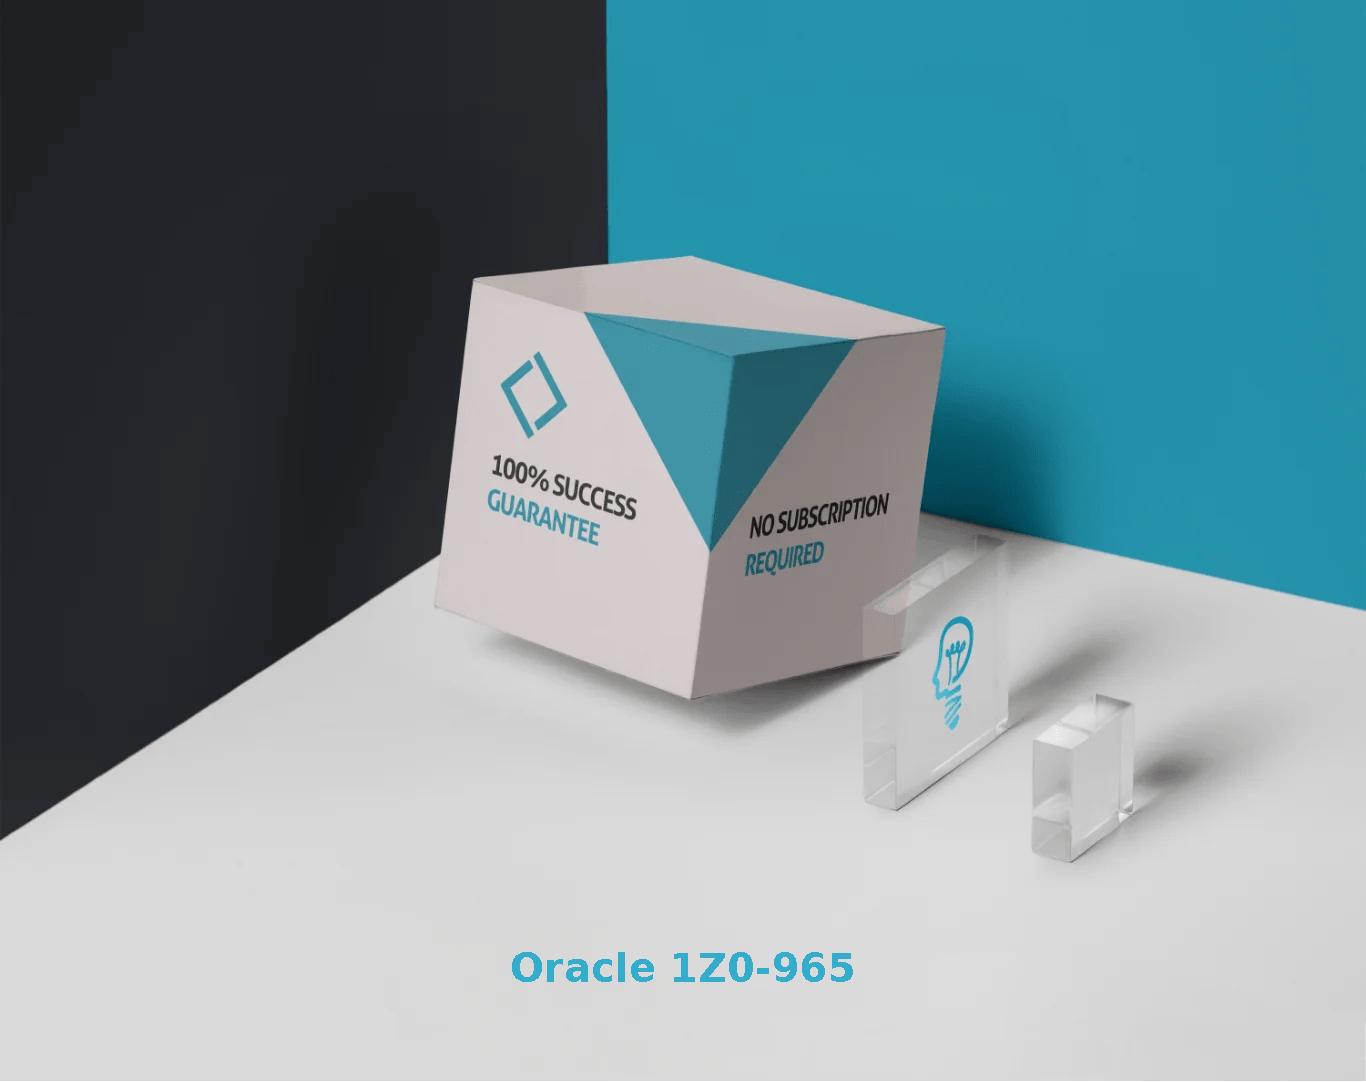 Oracle 1Z0-965 Exams